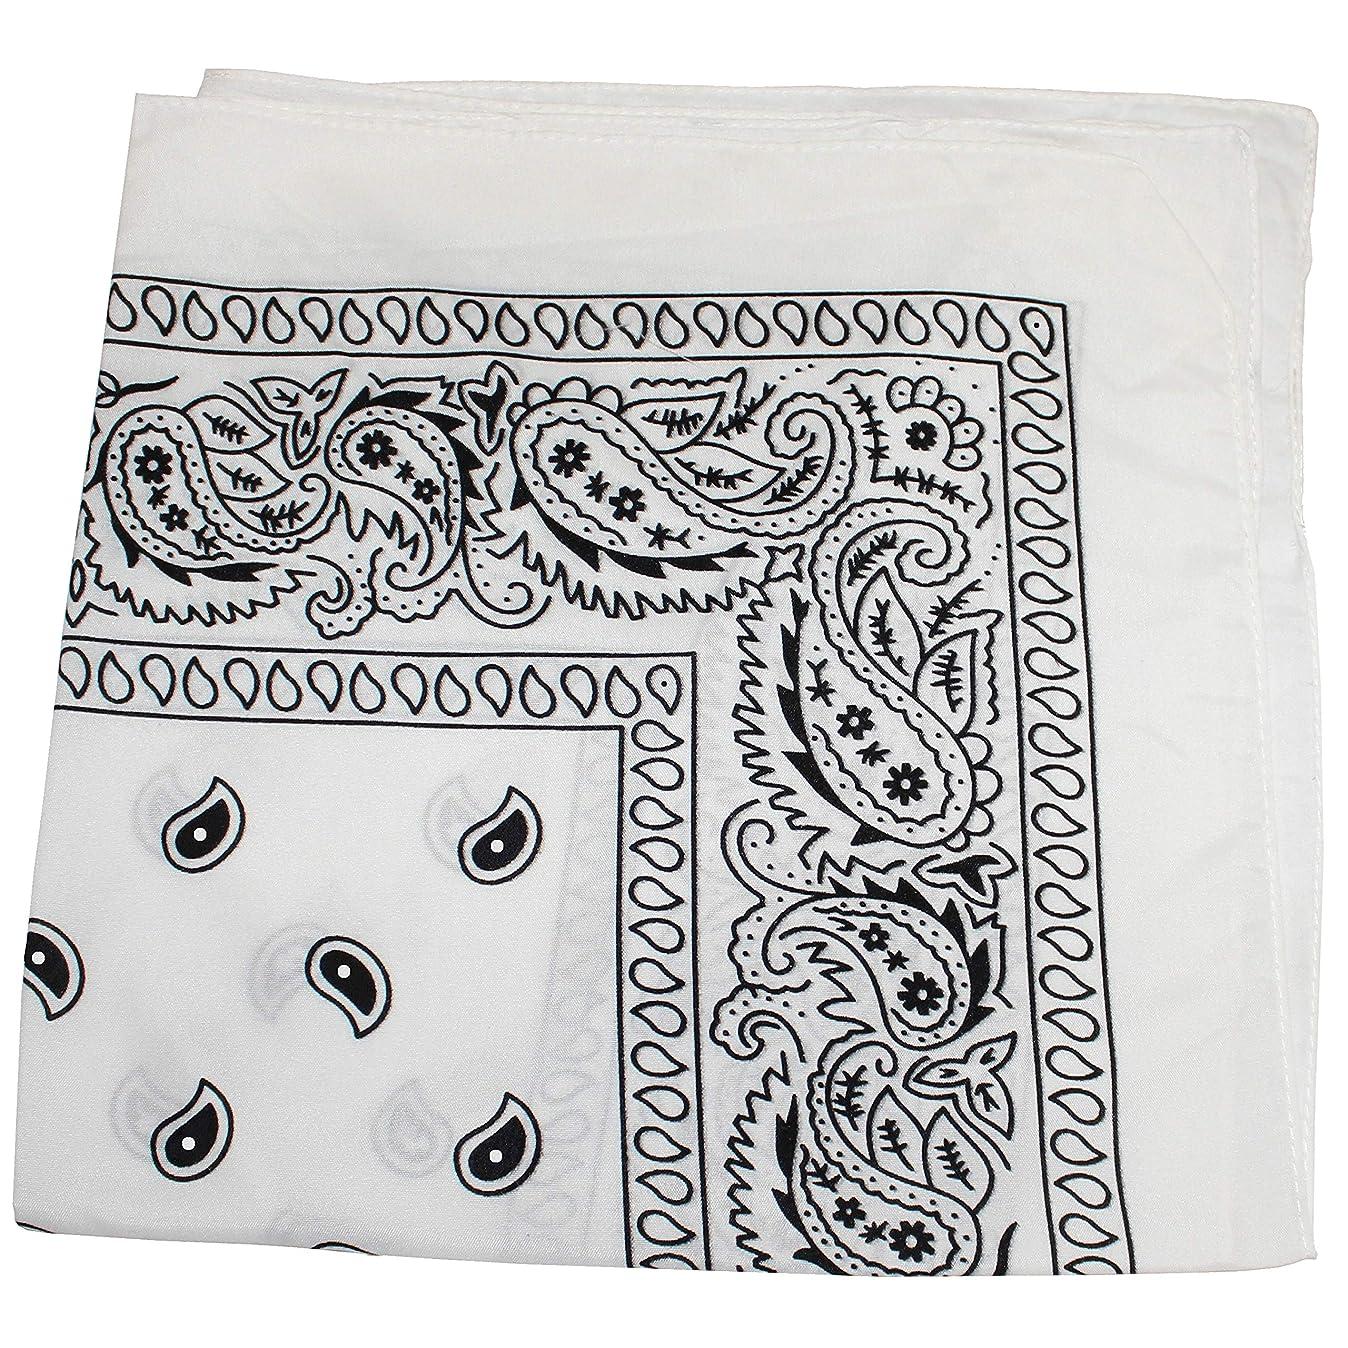 Pack of 48 Paisley 100% Cotton Bandanas Novelty Headwraps - Bulk Wholesale - 22 inches o1436325364